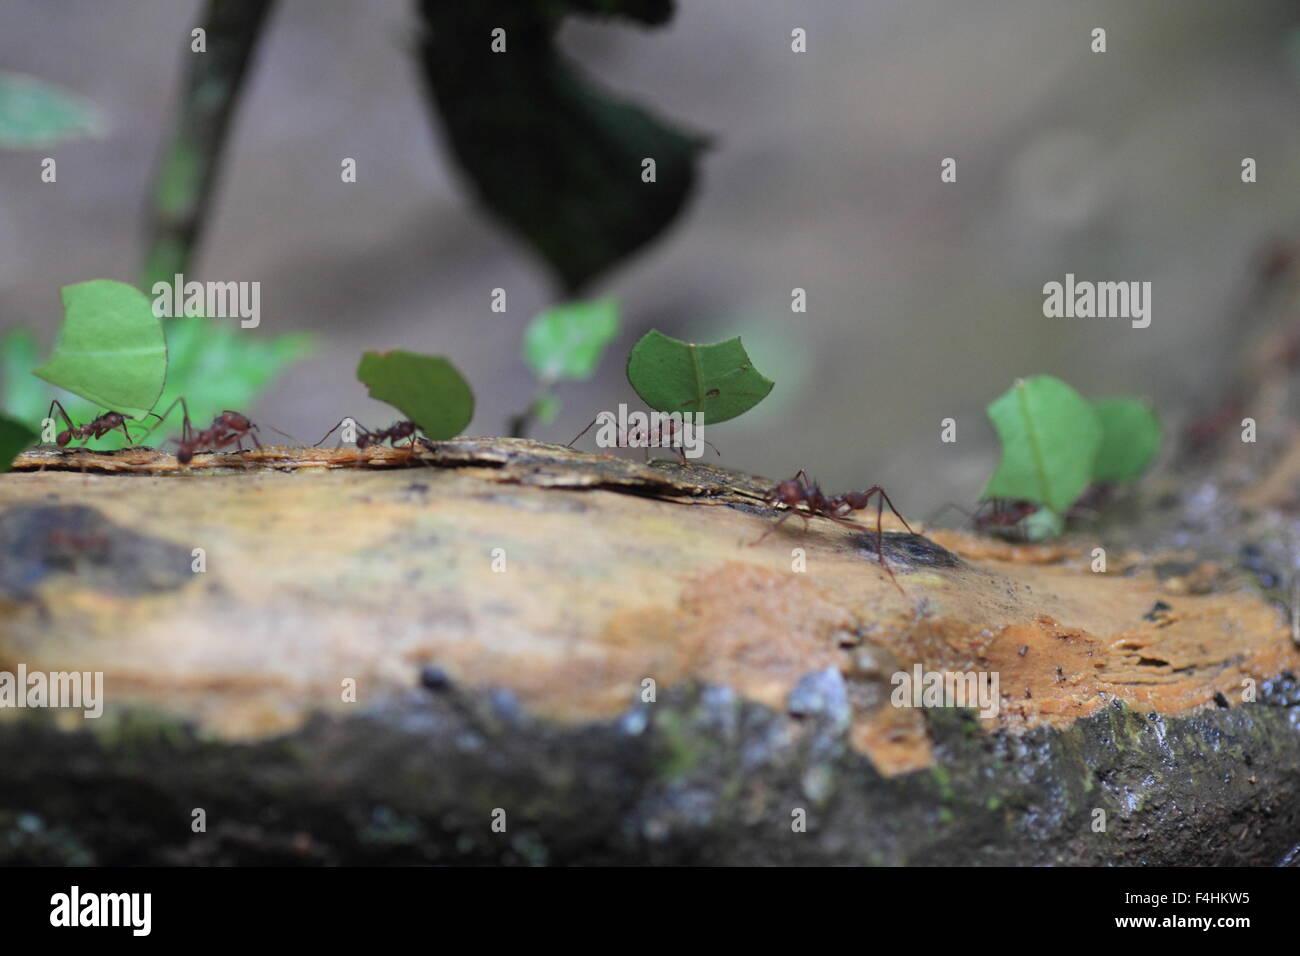 (Atta sexdens Leafcutter hormigas). La vida silvestre animal. Imagen De Stock